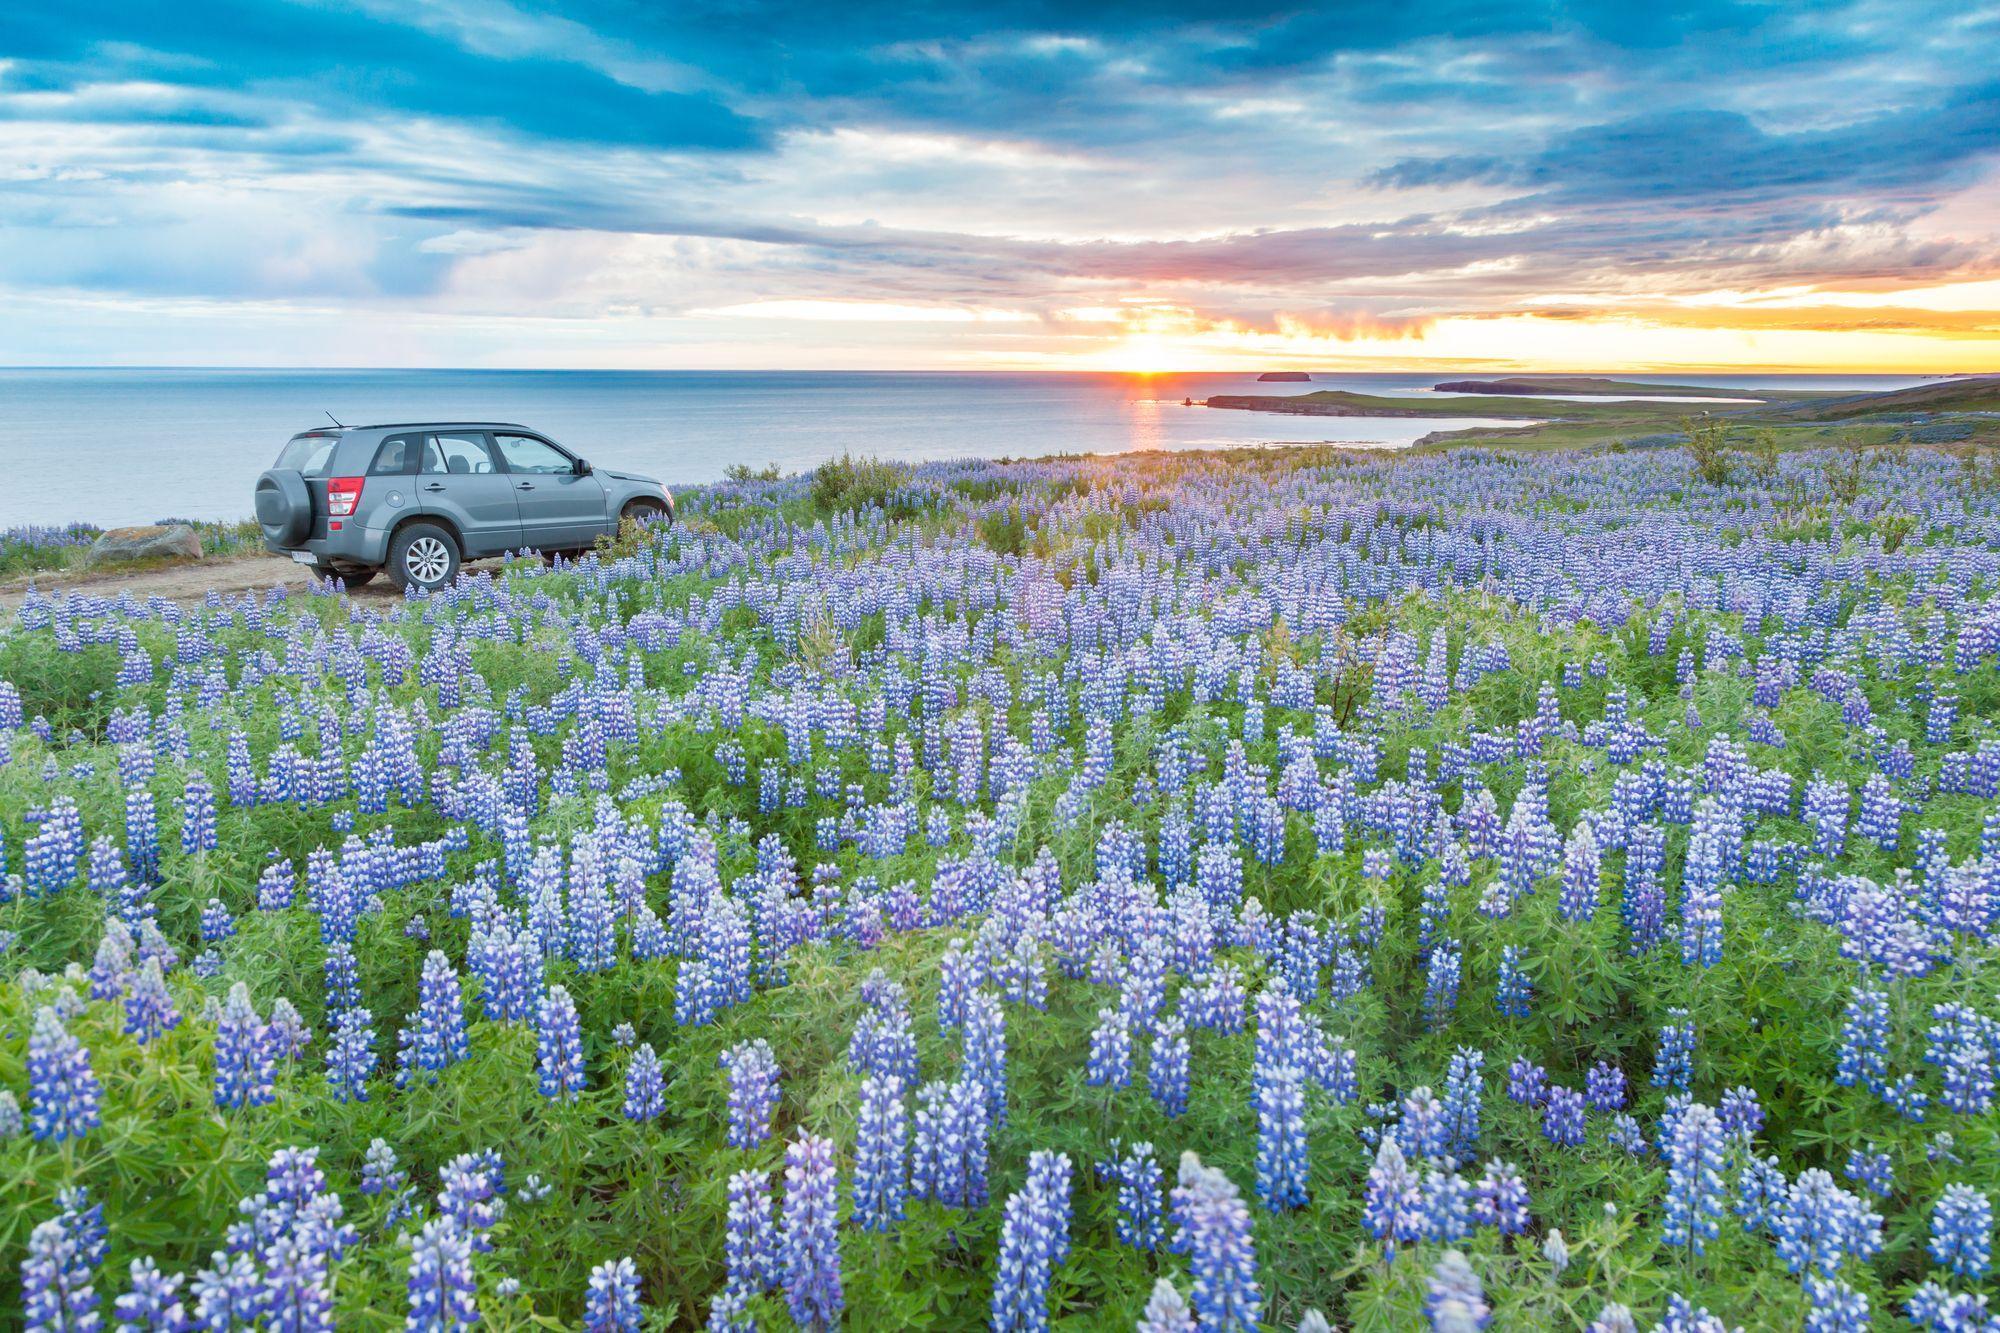 Kelionė po Islandiją automobiliu